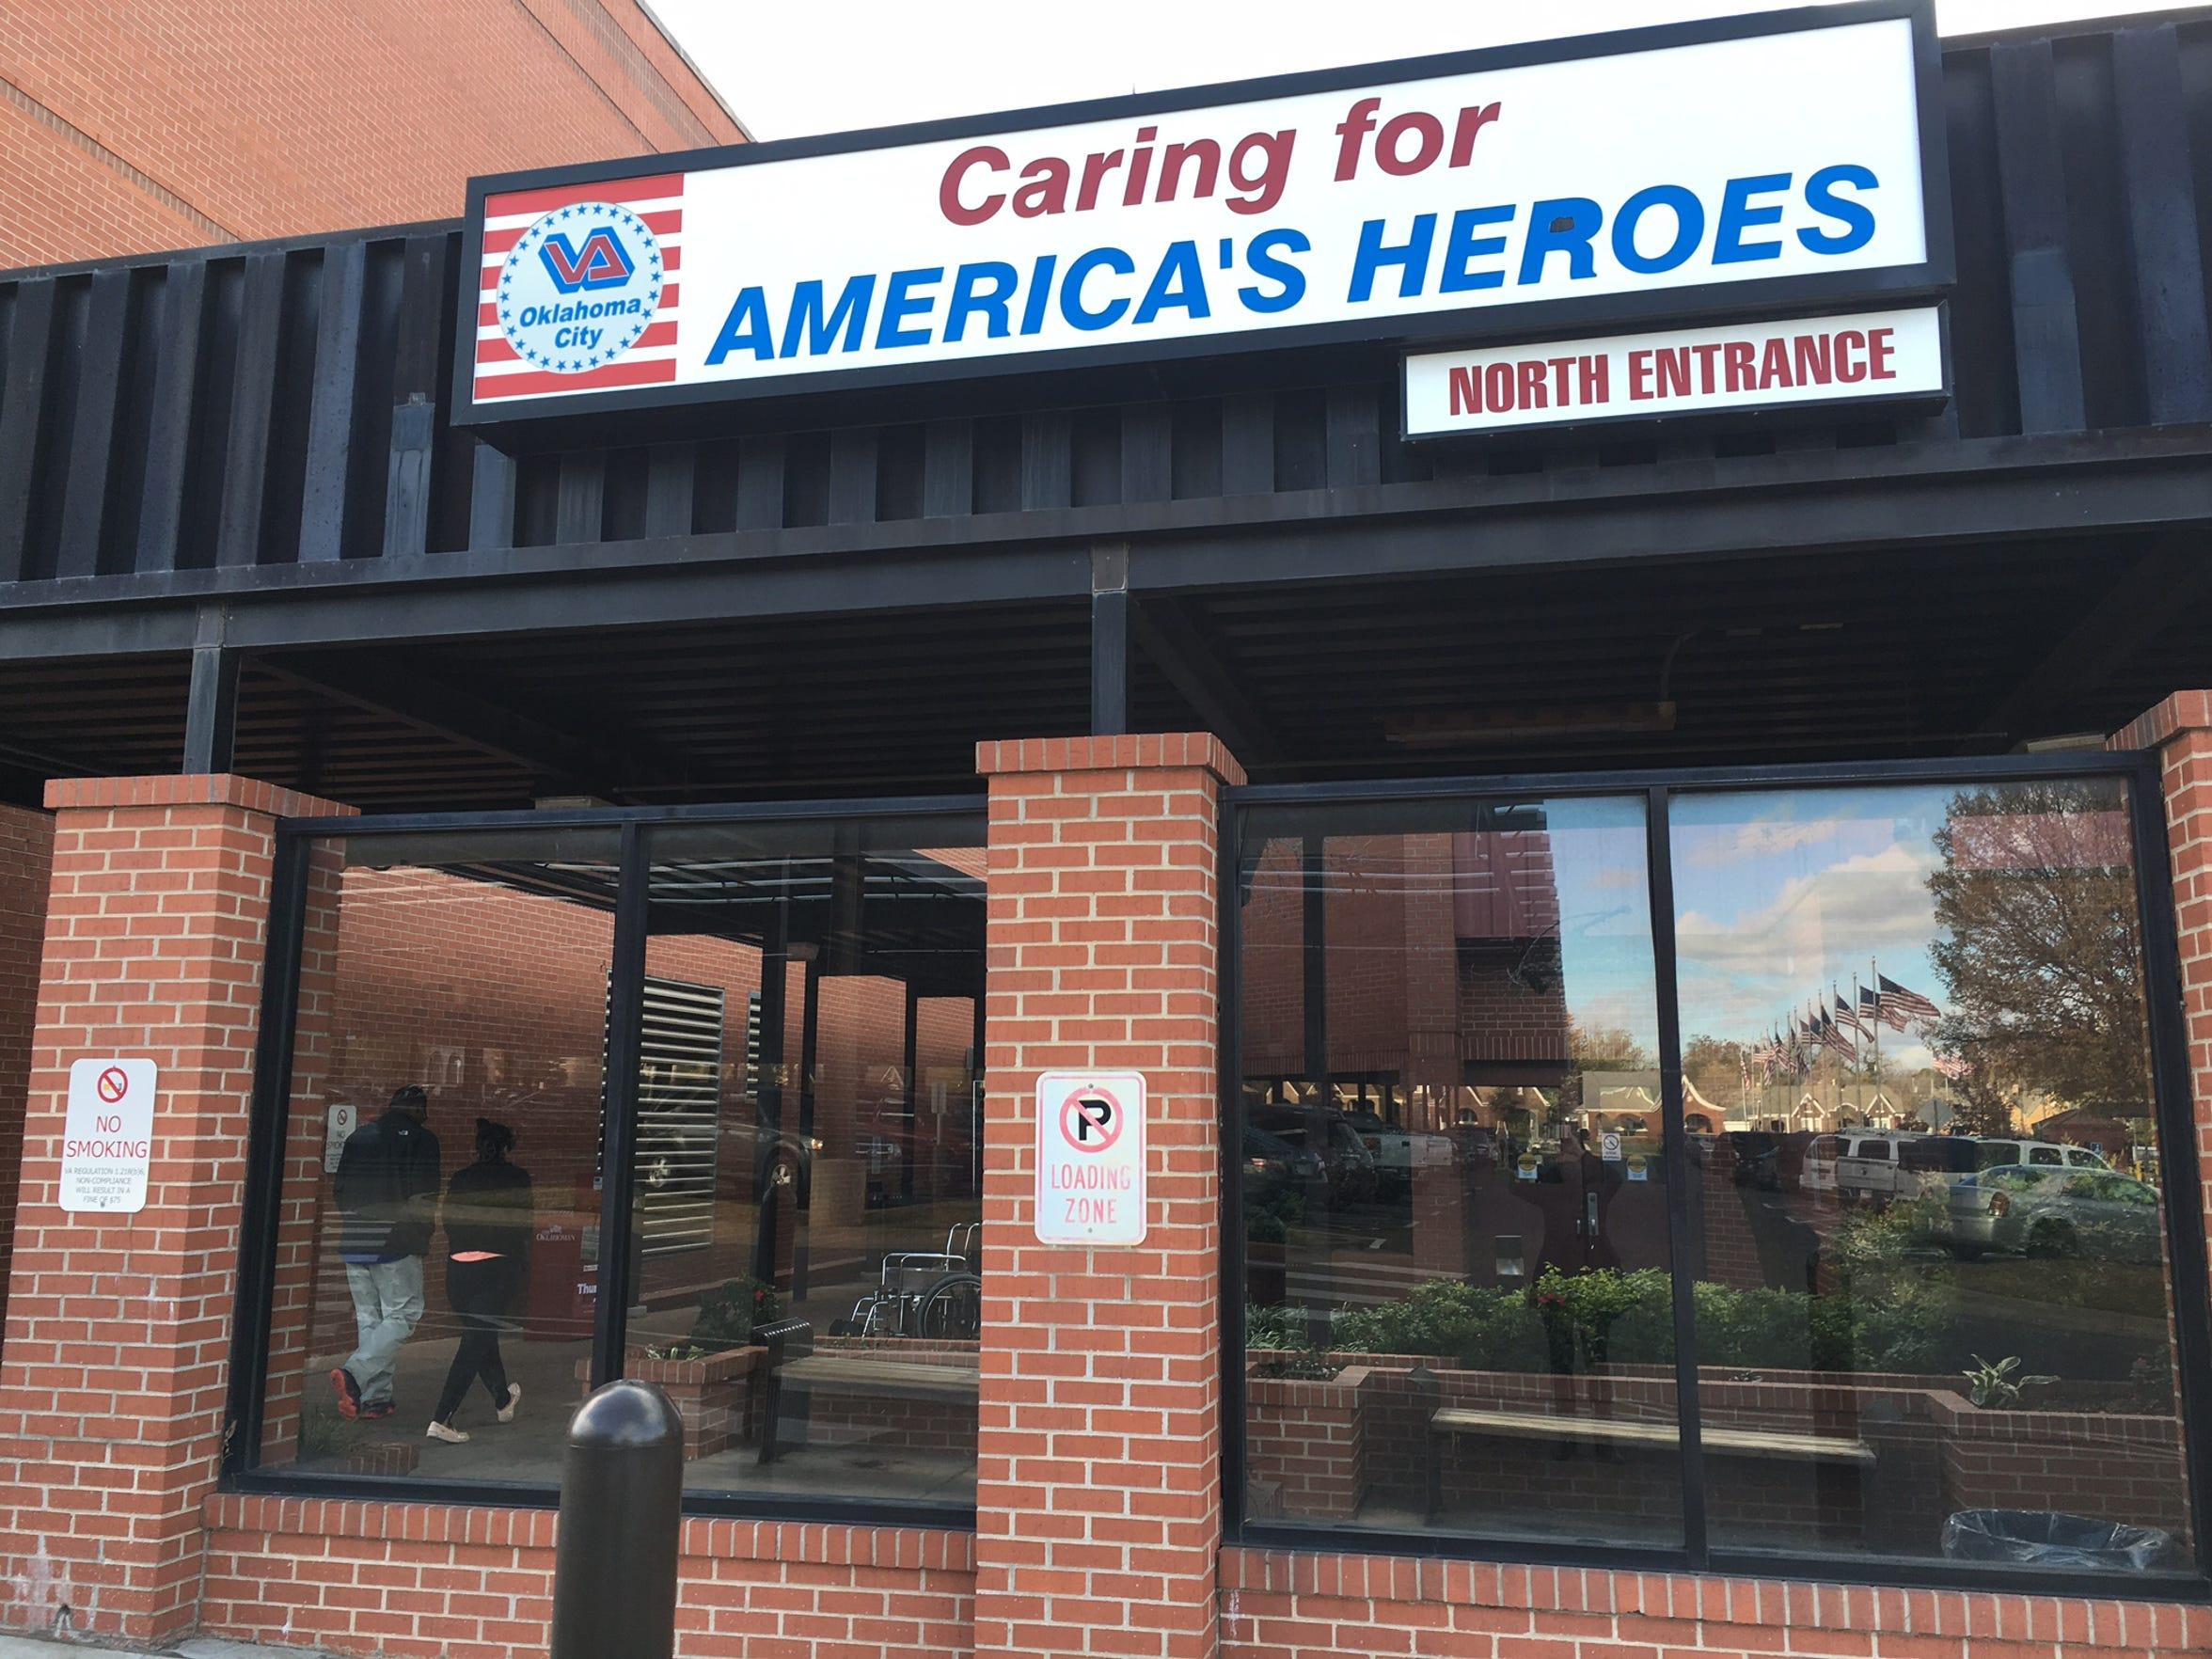 The Oklahoma City Veterans' Affairs Medical Center treats 60,000 veterans annually.